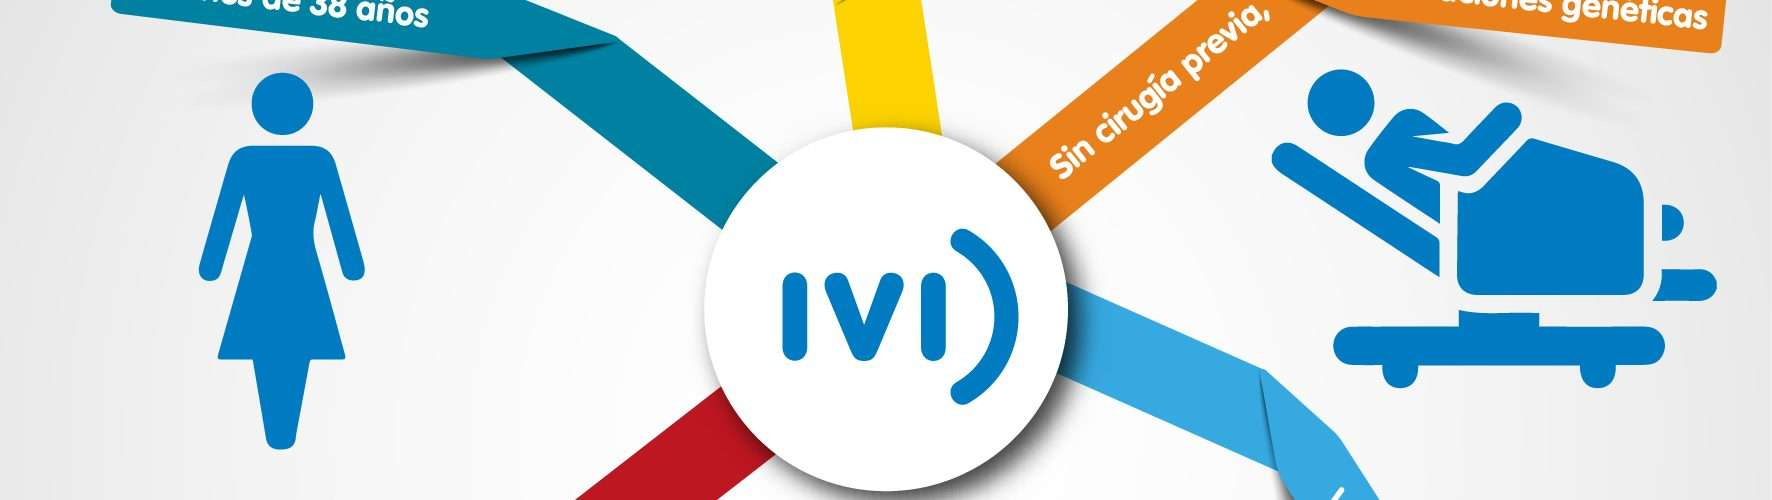 IVI busca candidatas para estudio fallo ovárico